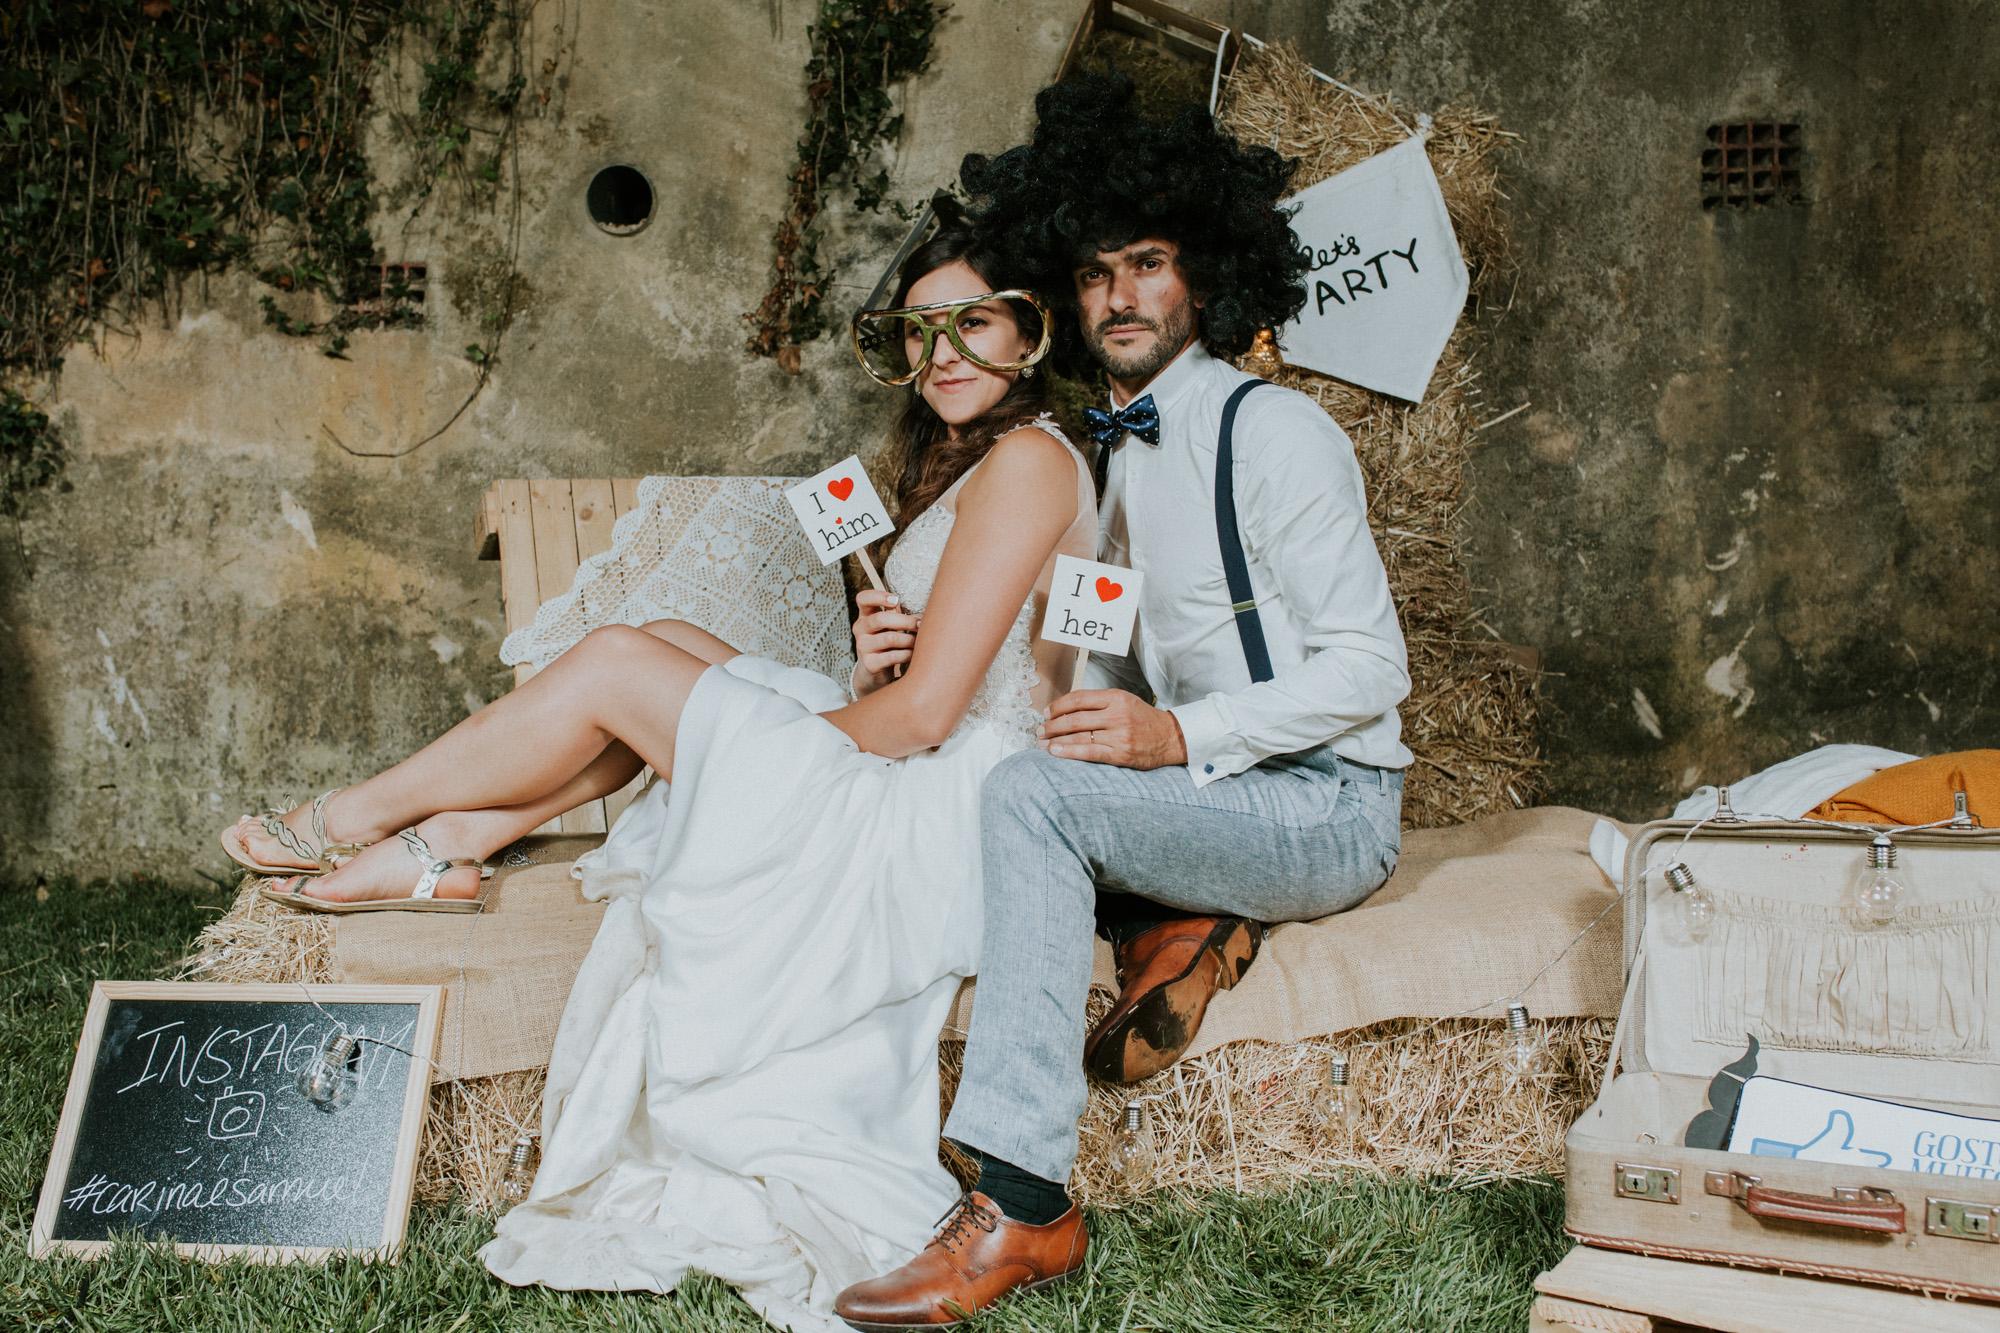 001-carina-e-samuel-wedding-casamento-quinta-dos-rouxinois-rustico-my-fancy-wedding-mafra-malveira-lisboa-sintra-cascais-filipe-santiago-fotografia-fotografo-lifestyle-destination-portugal